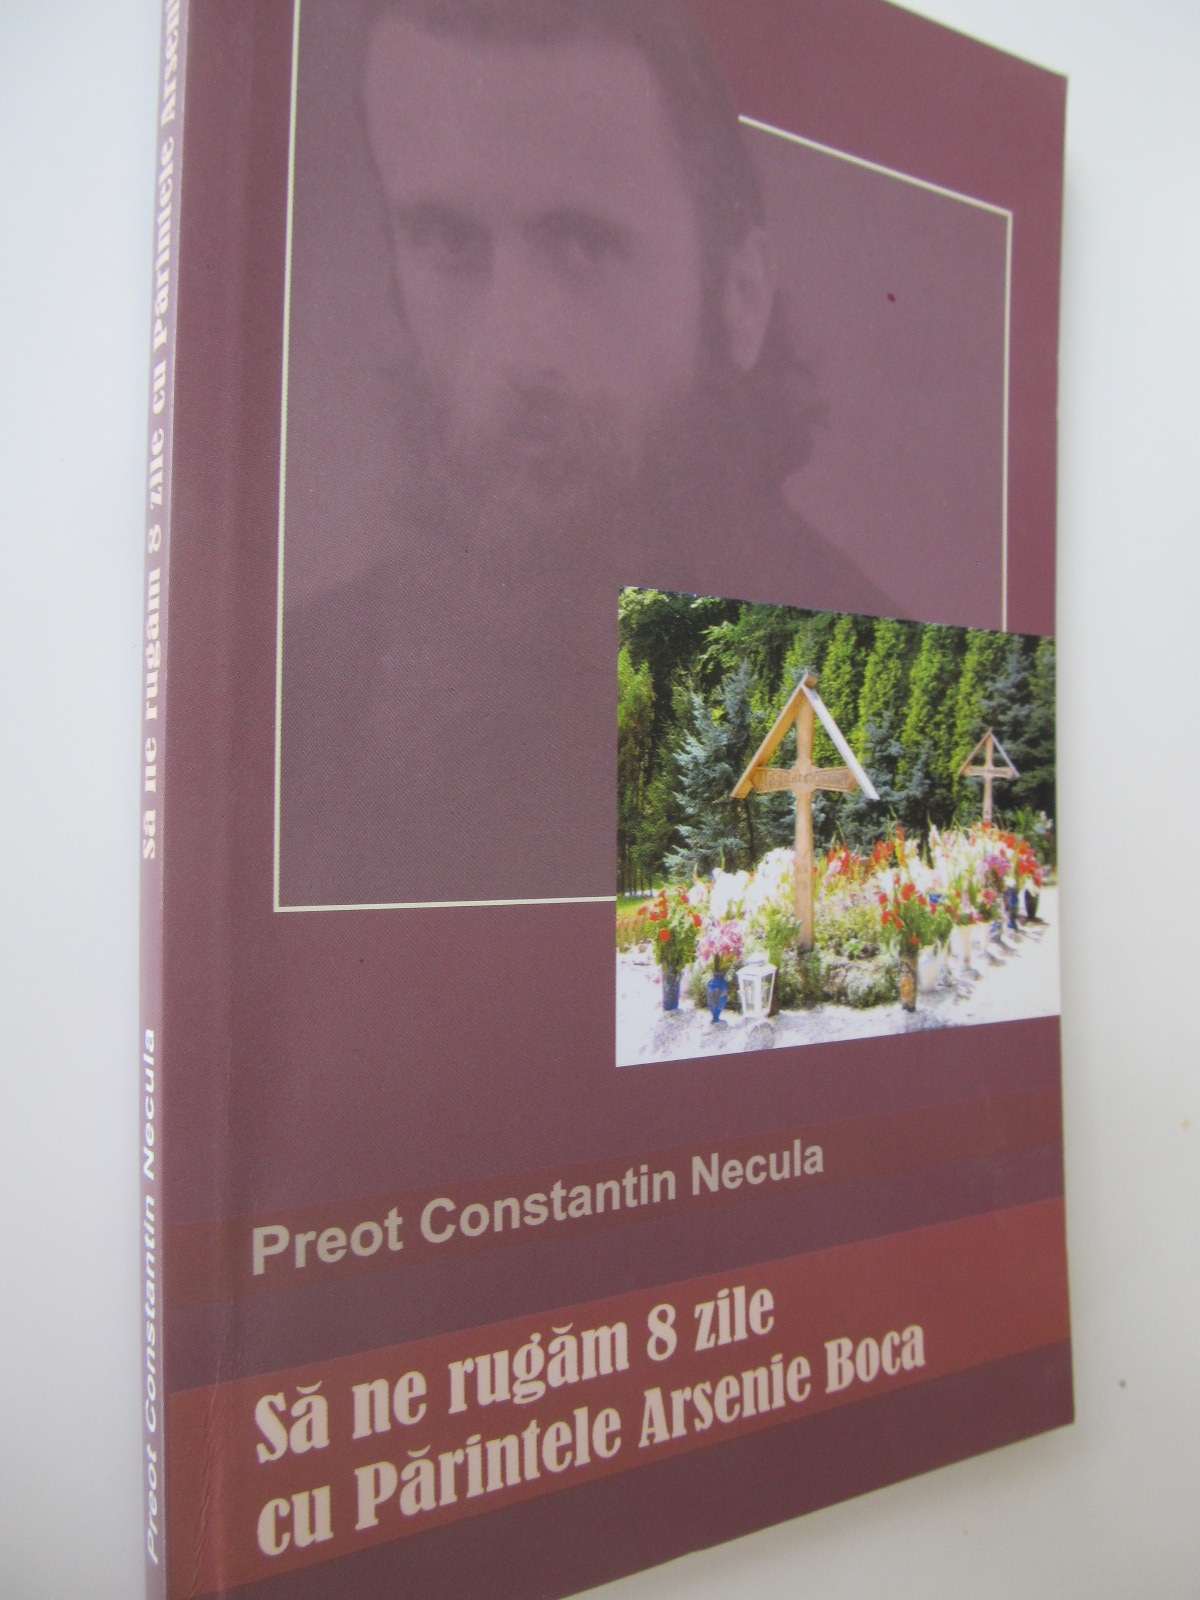 Sa ne rugam 8 zile cu Parintele Arsenie Boca - Preot Constantin Necula | Detalii carte